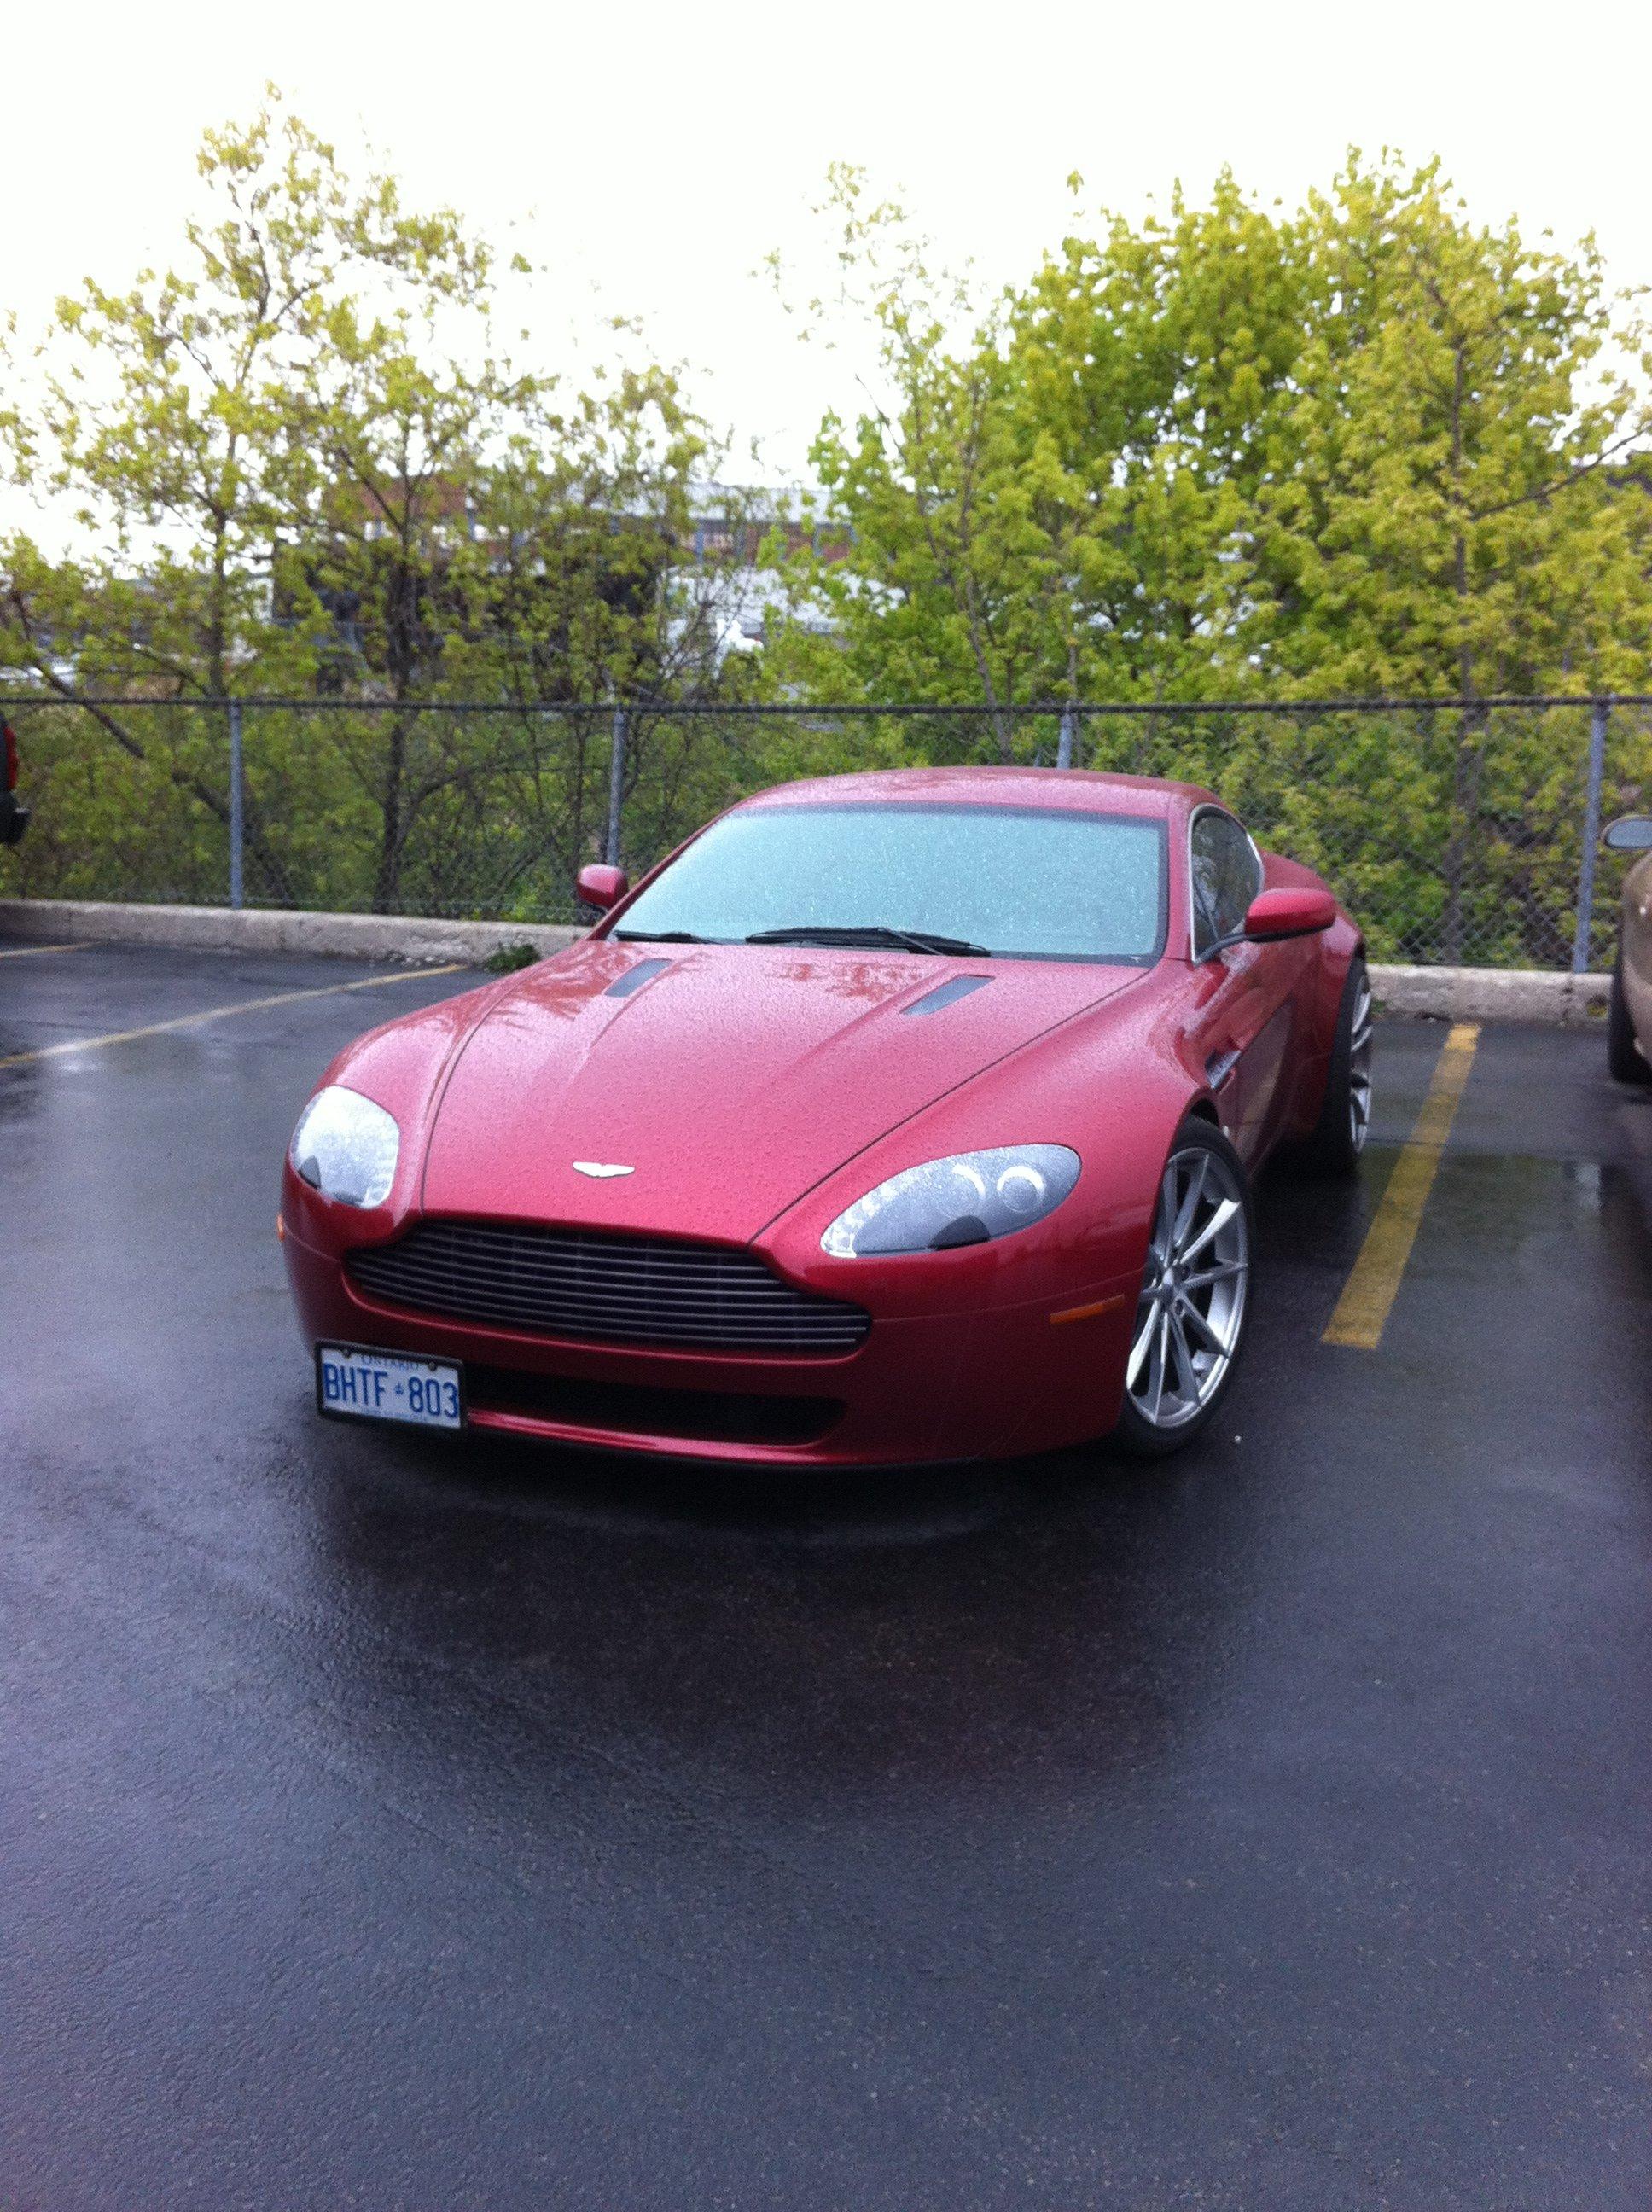 Aston Martin windshield replacement